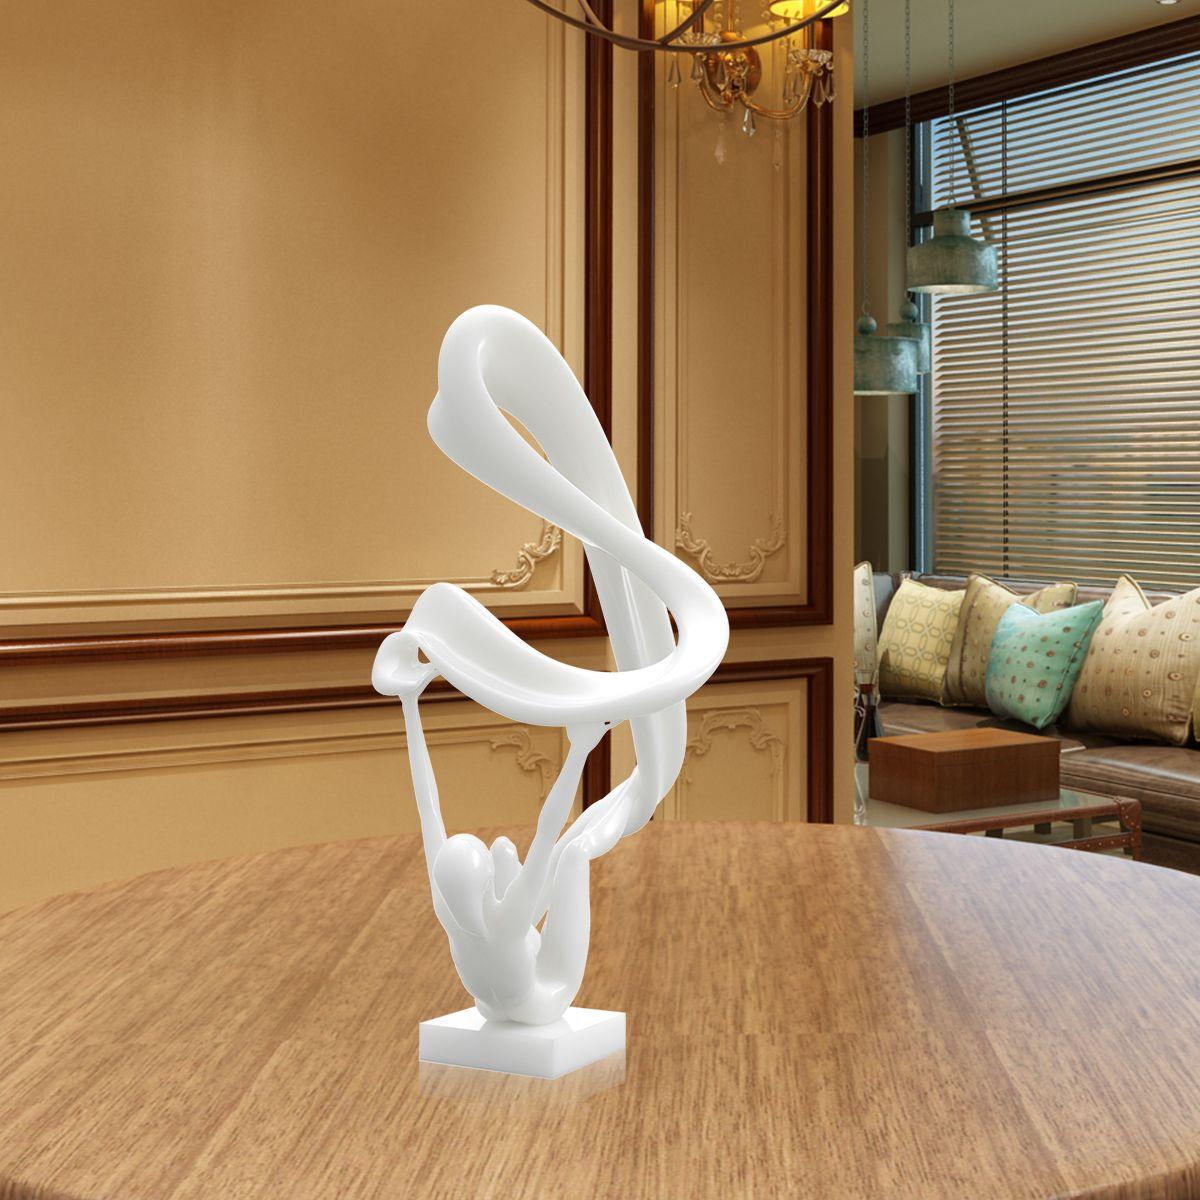 Tomfeel Flutter 3D Gedruckte Abstrakte Skulptur Moderne Wohnkultur